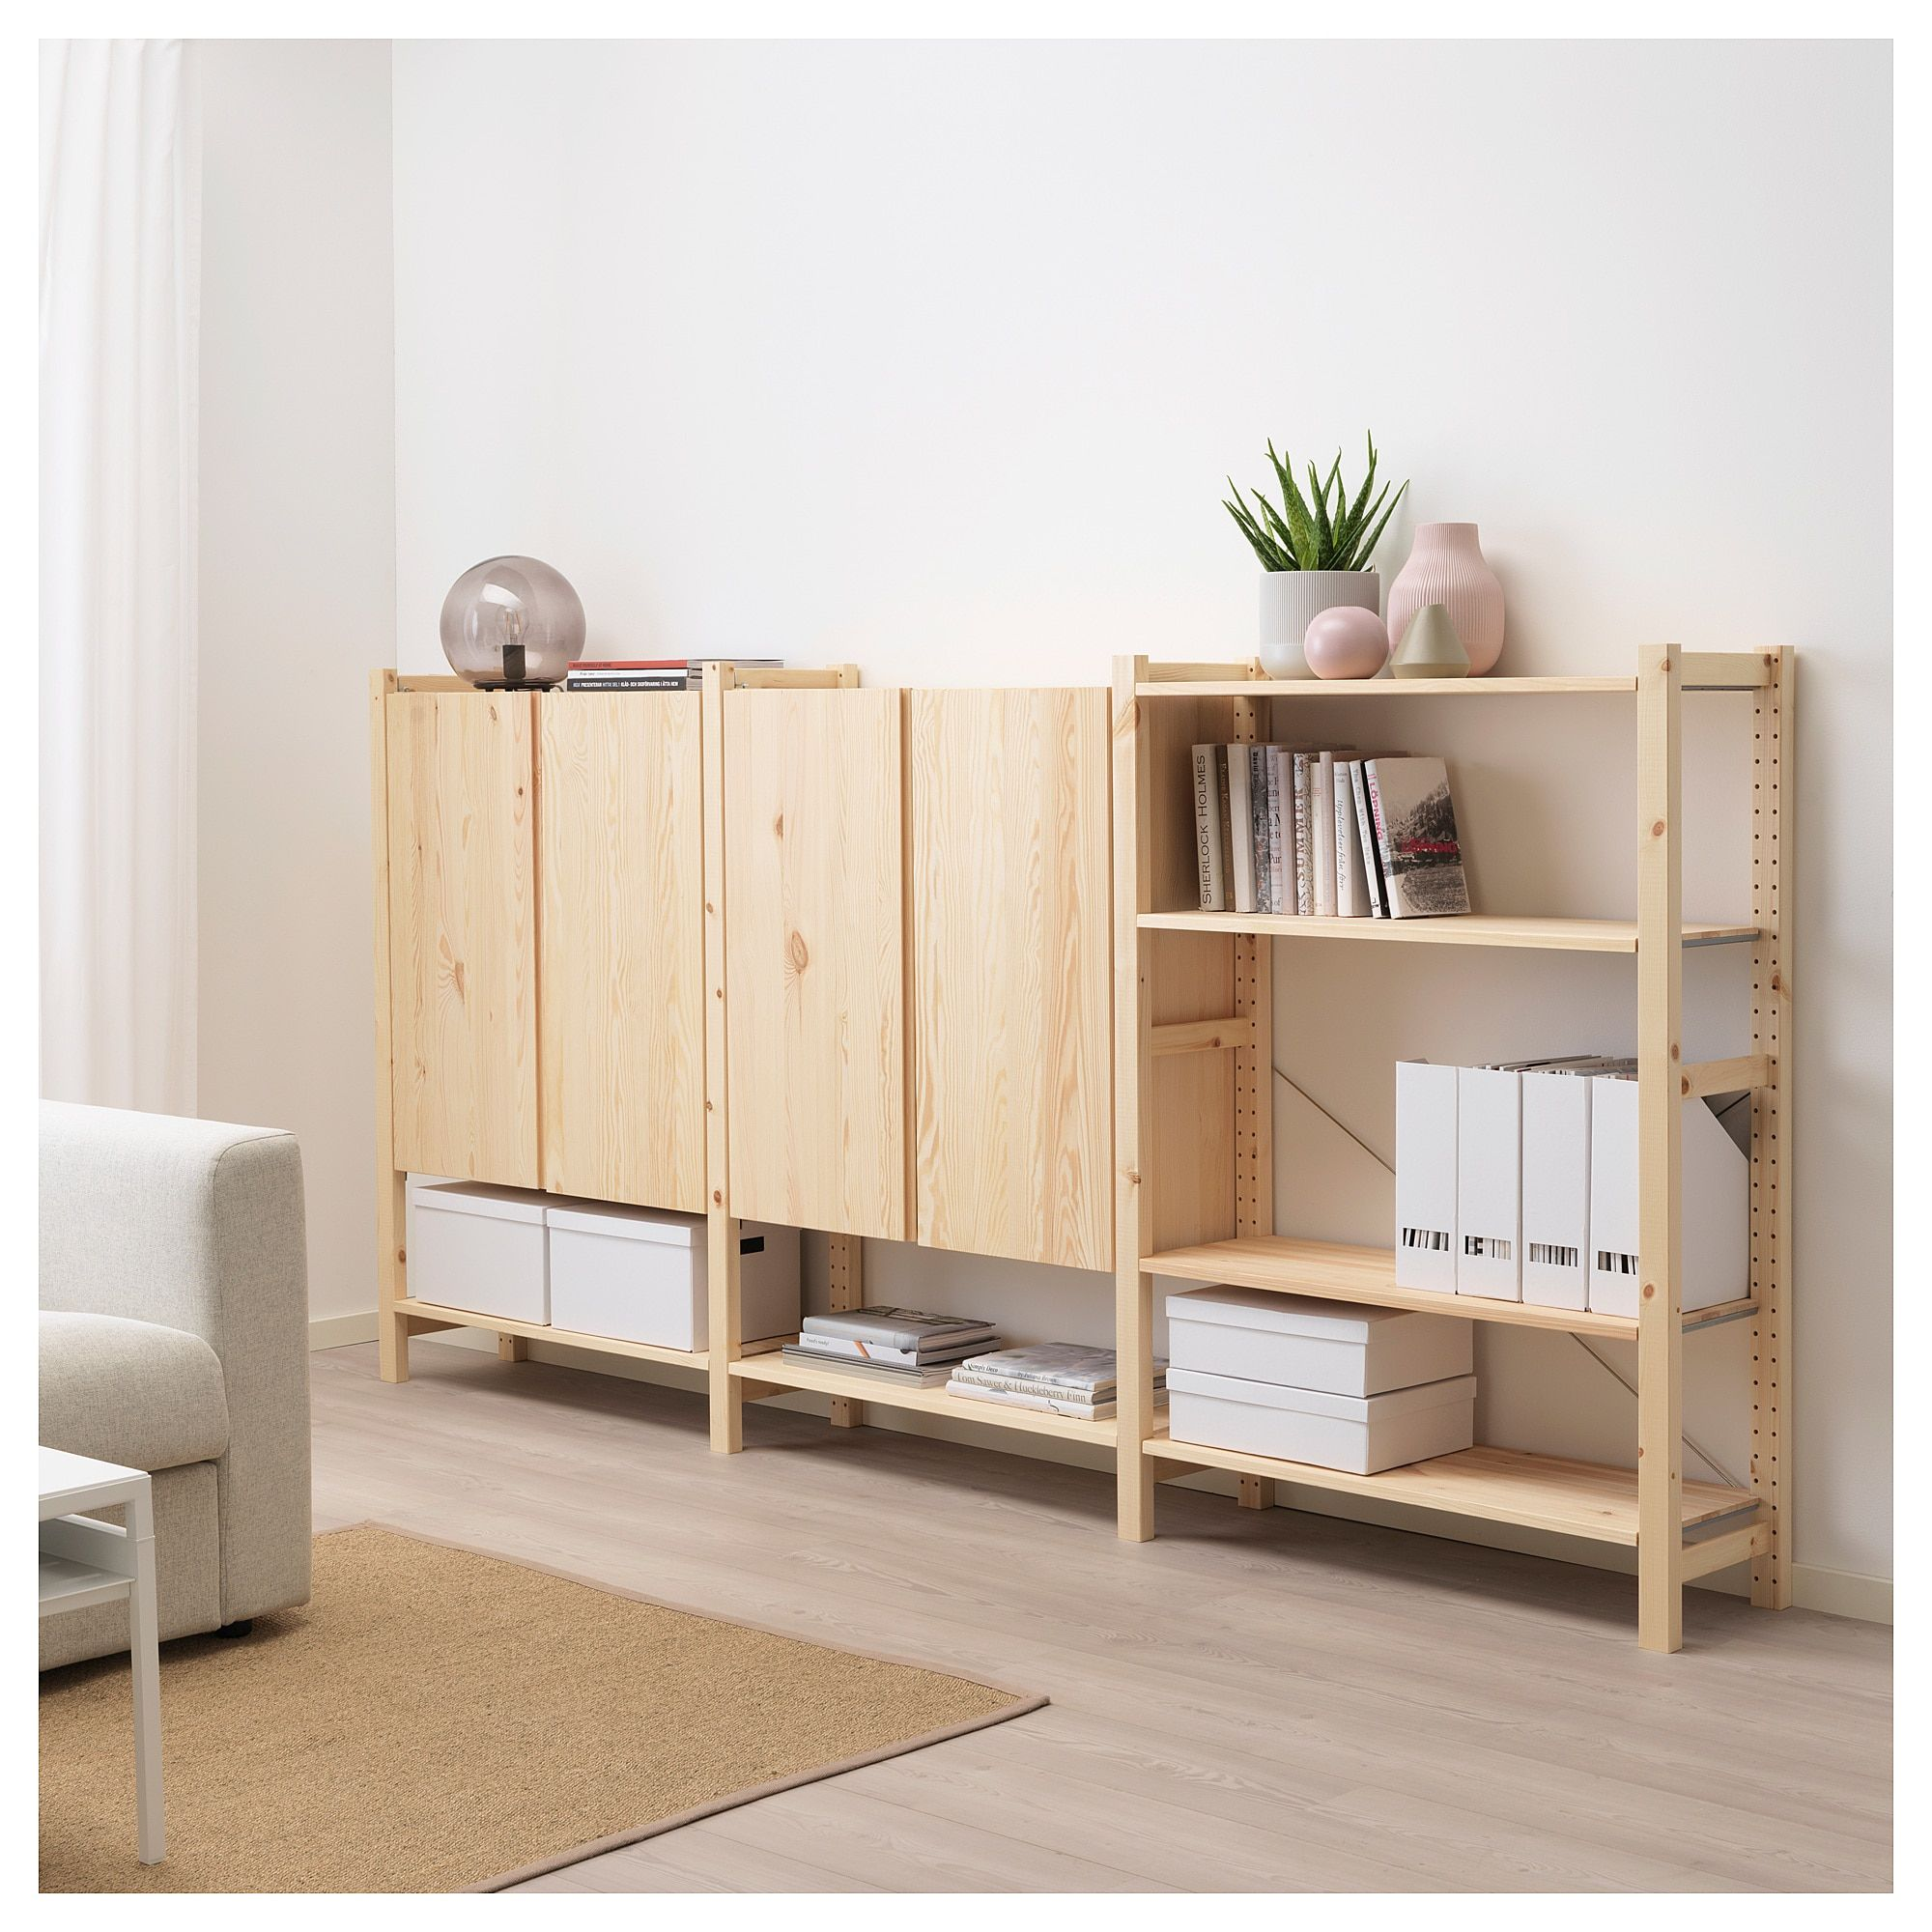 Ivar Cabinet Pine 32x12x33 Ikea Ikea Rayonnage Mobilier De Salon